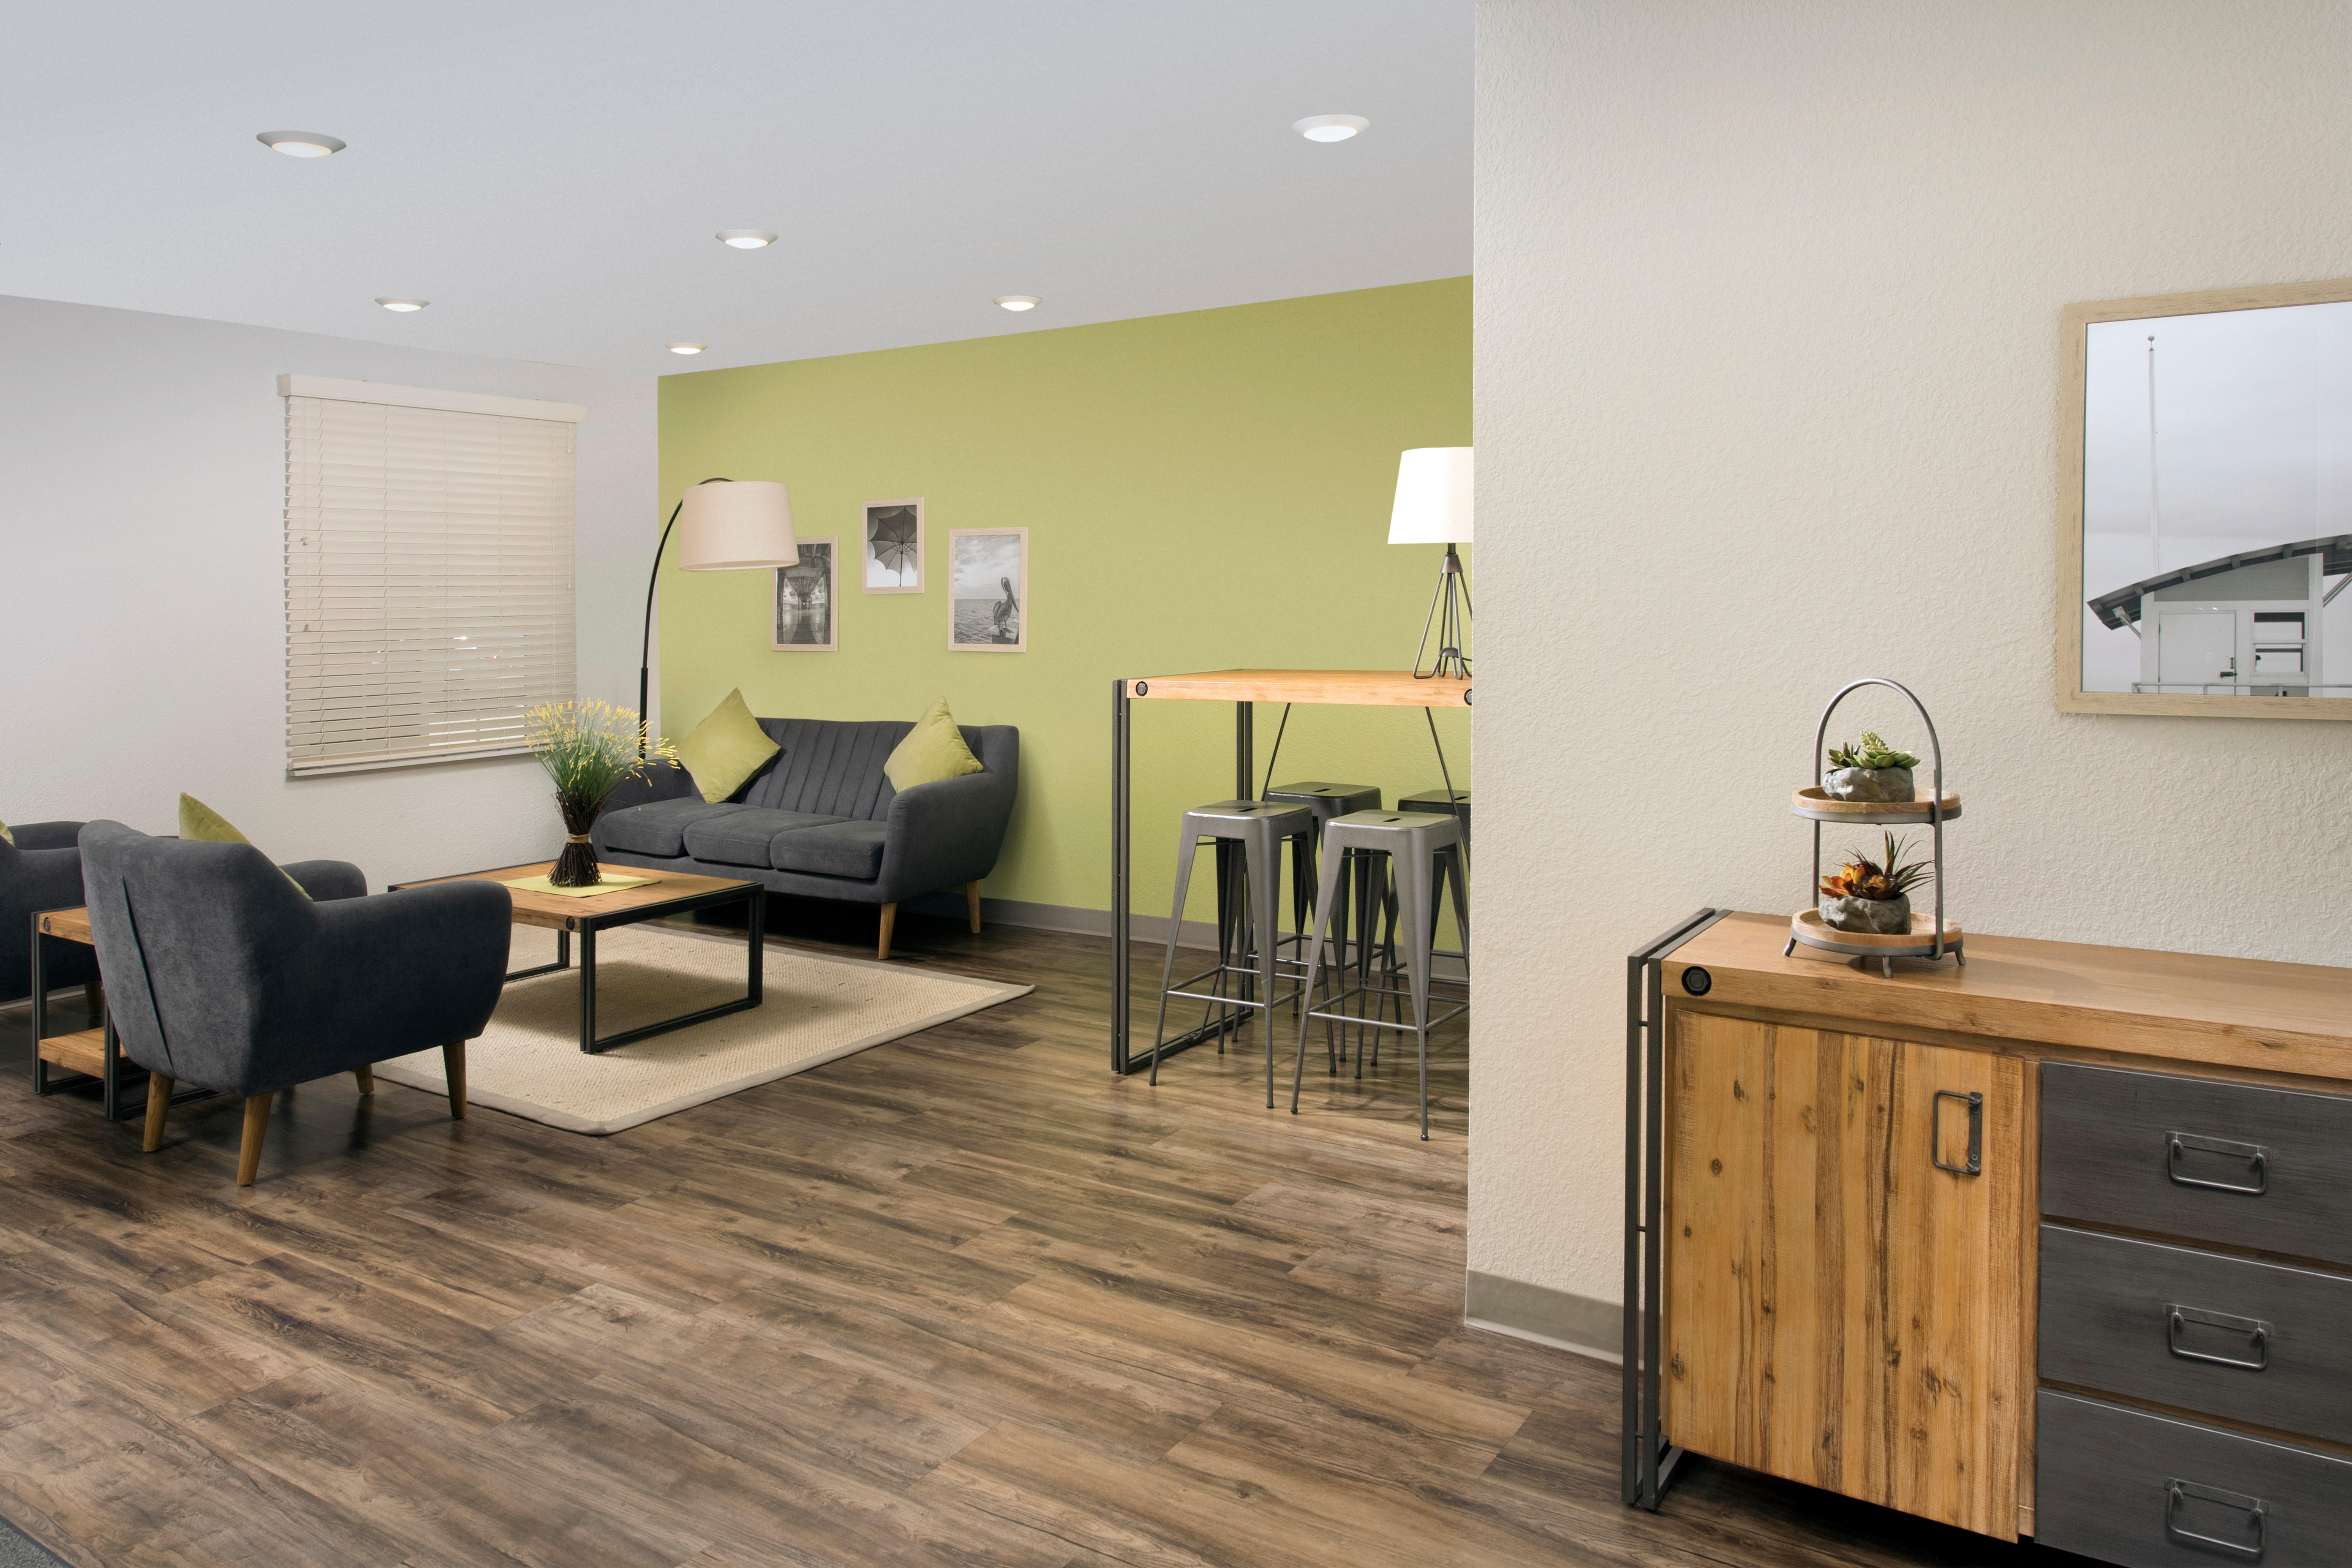 WoodSpring Suites Clearwater image 6